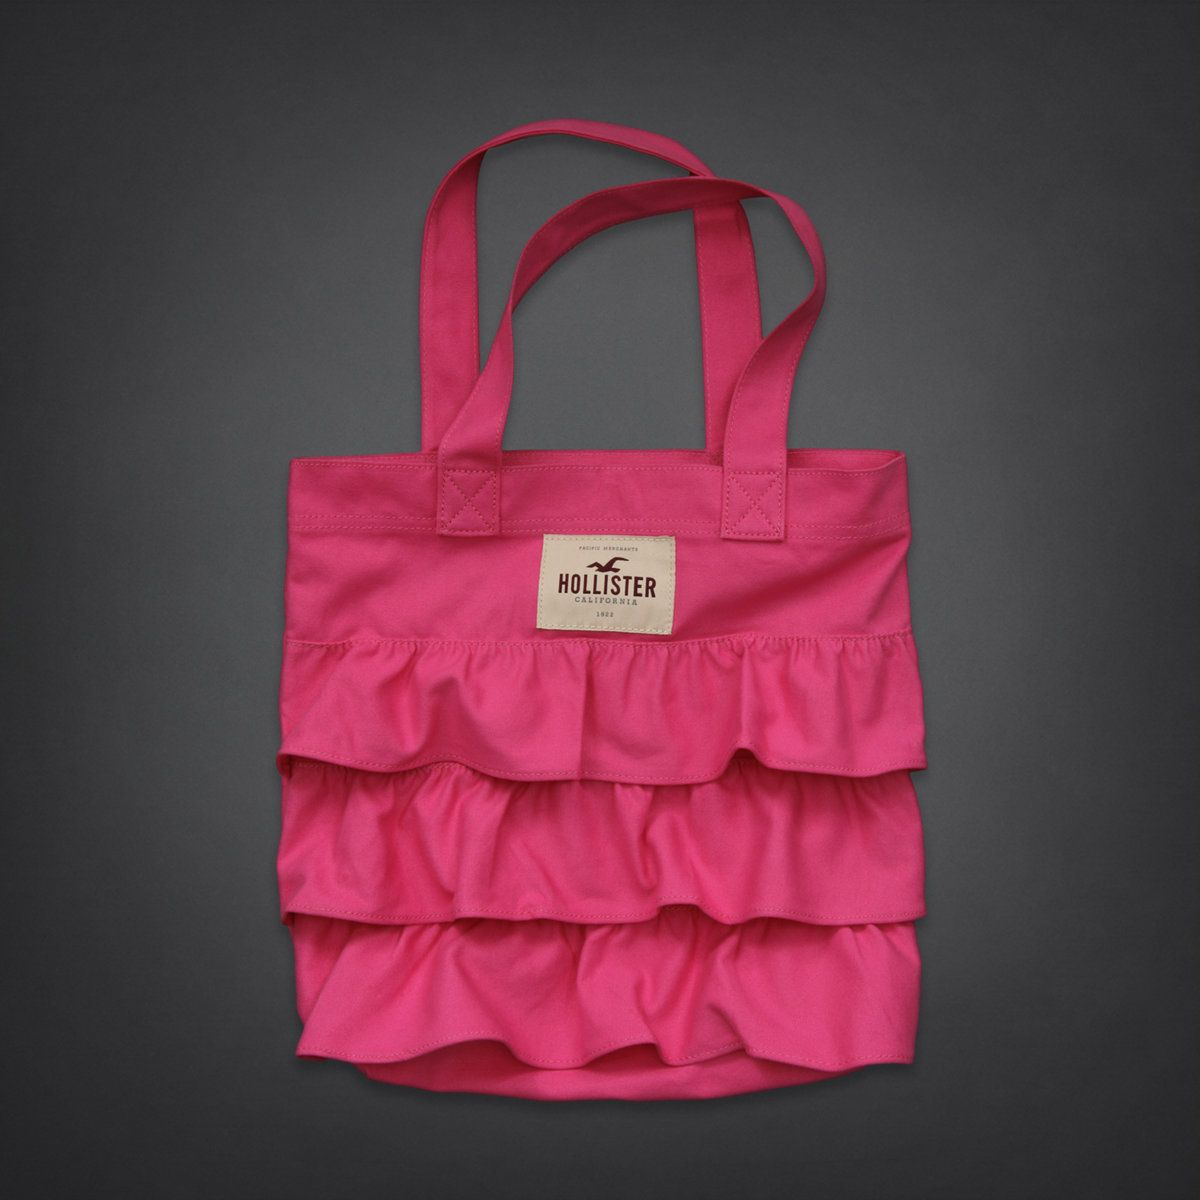 So Cal Hollister Tote Bag I Love The Ruffles